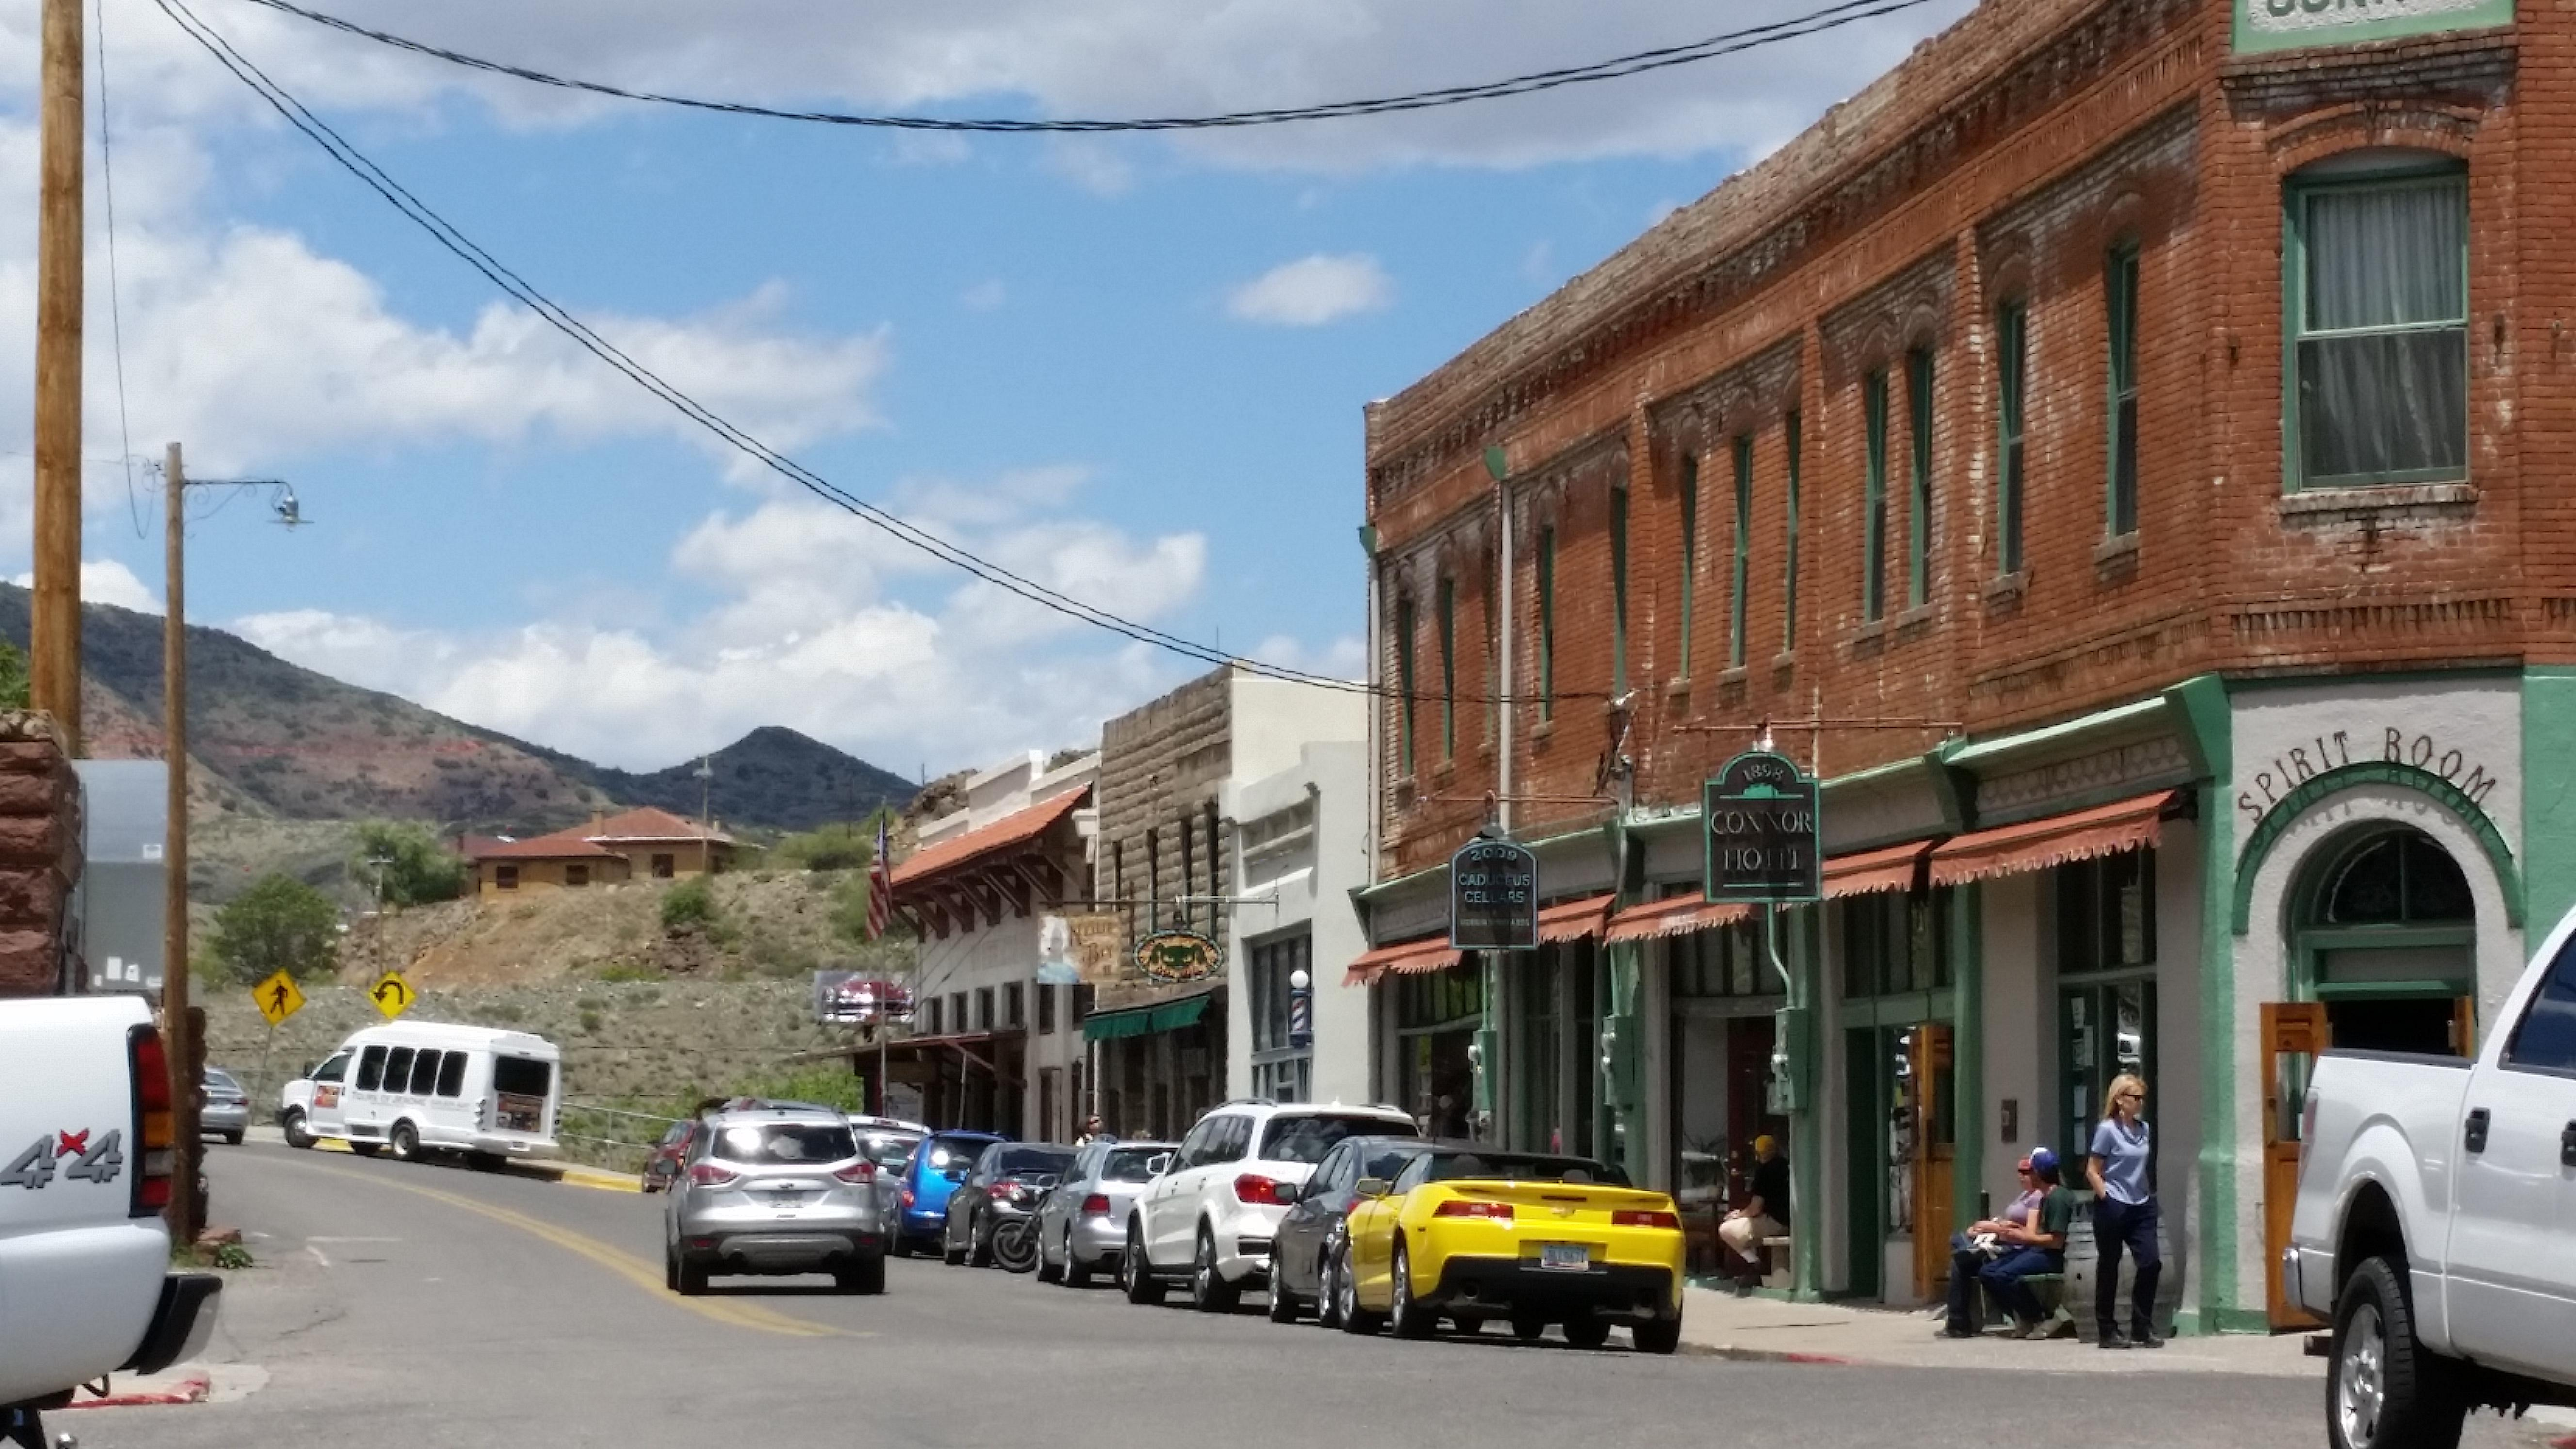 Jerome, AZ. Historical main street. | Favorite places